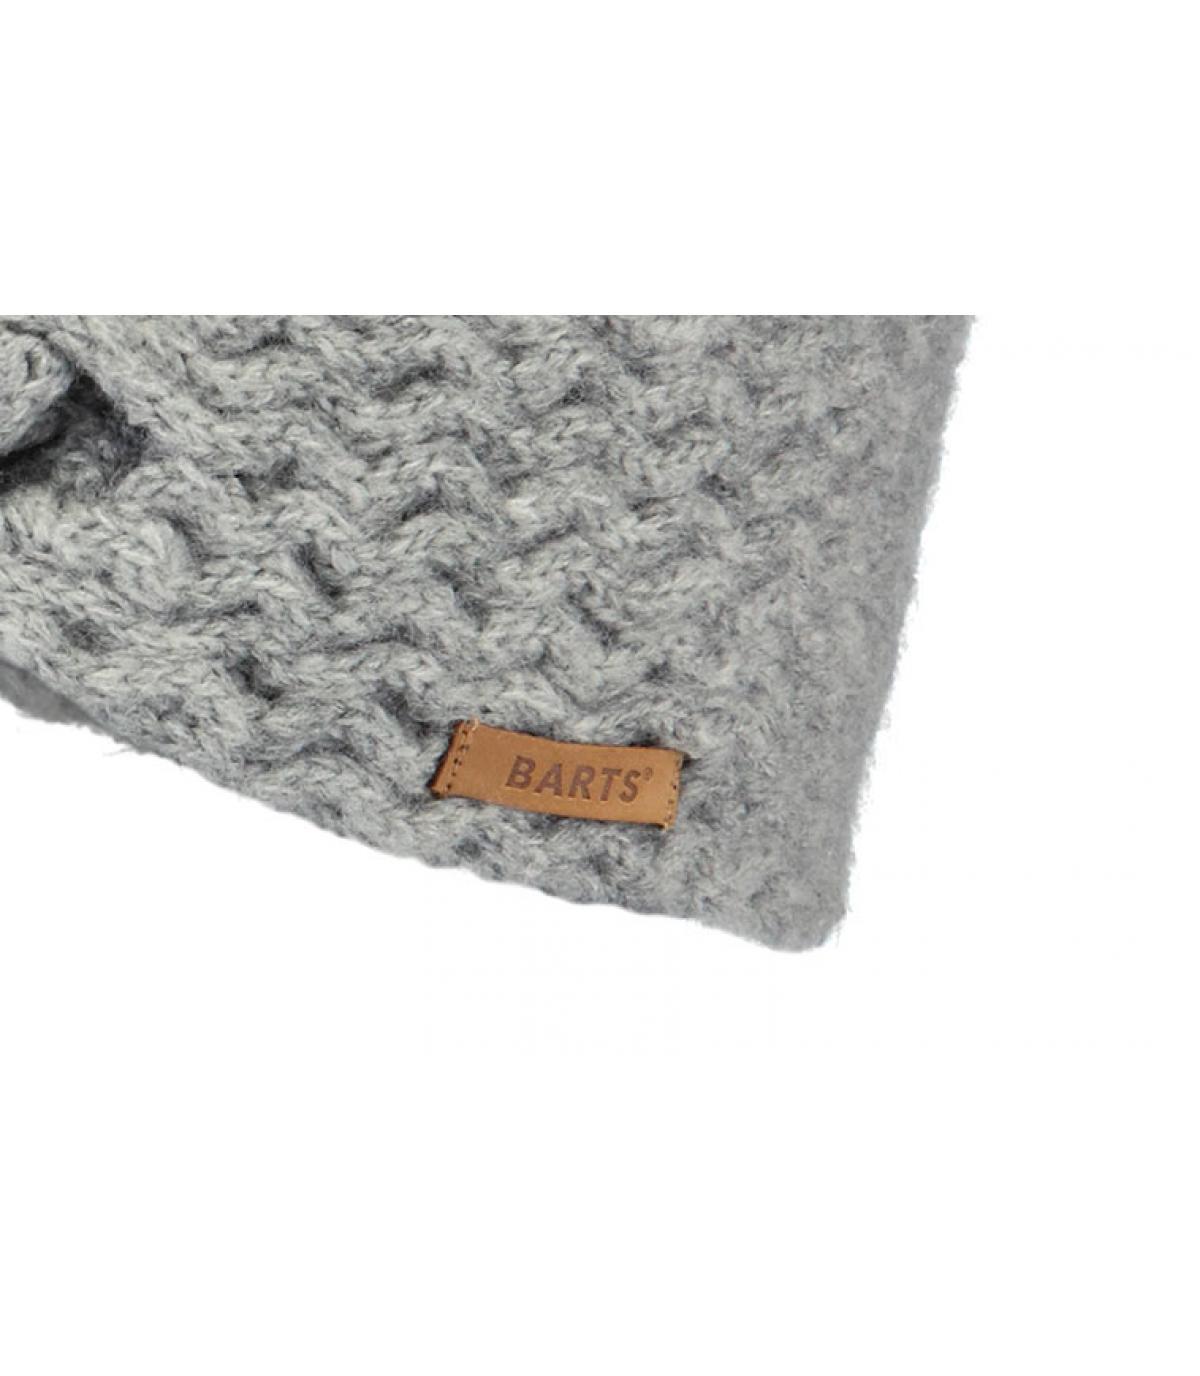 Details Kids Rozamond Headband heather grey - afbeeling 3